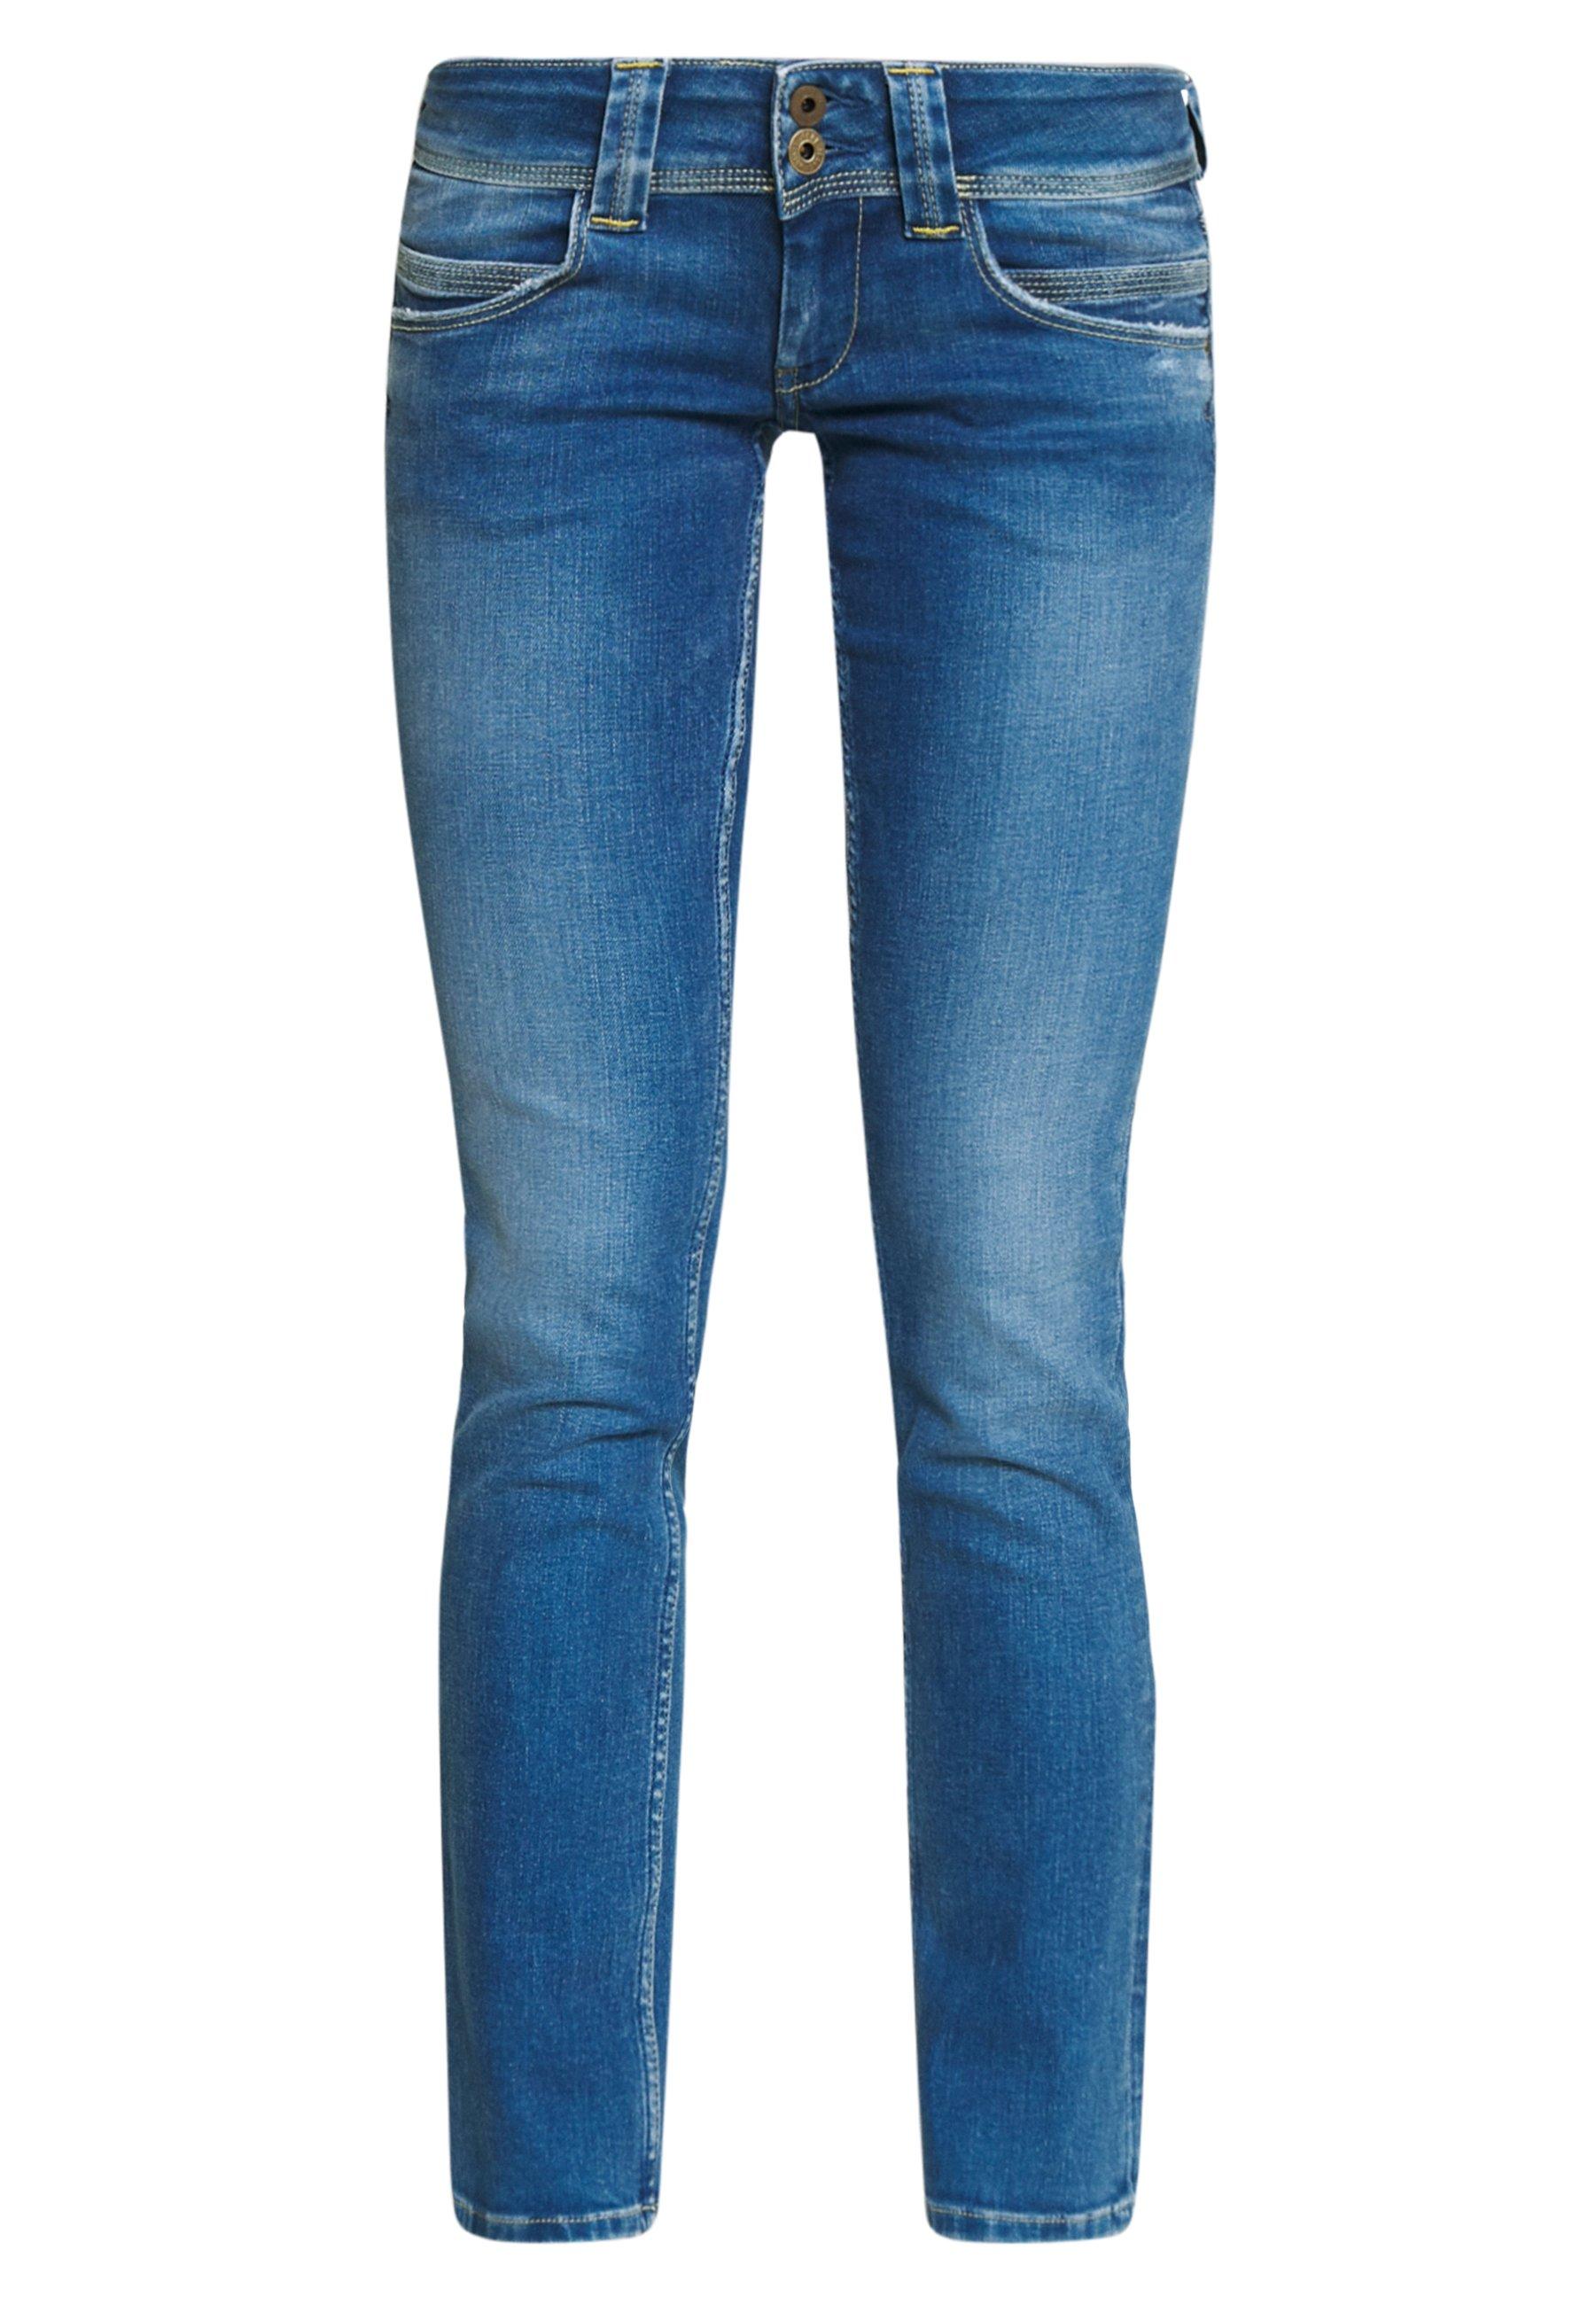 Pepe Jeans Venus - Slim Fit -farkut Denim